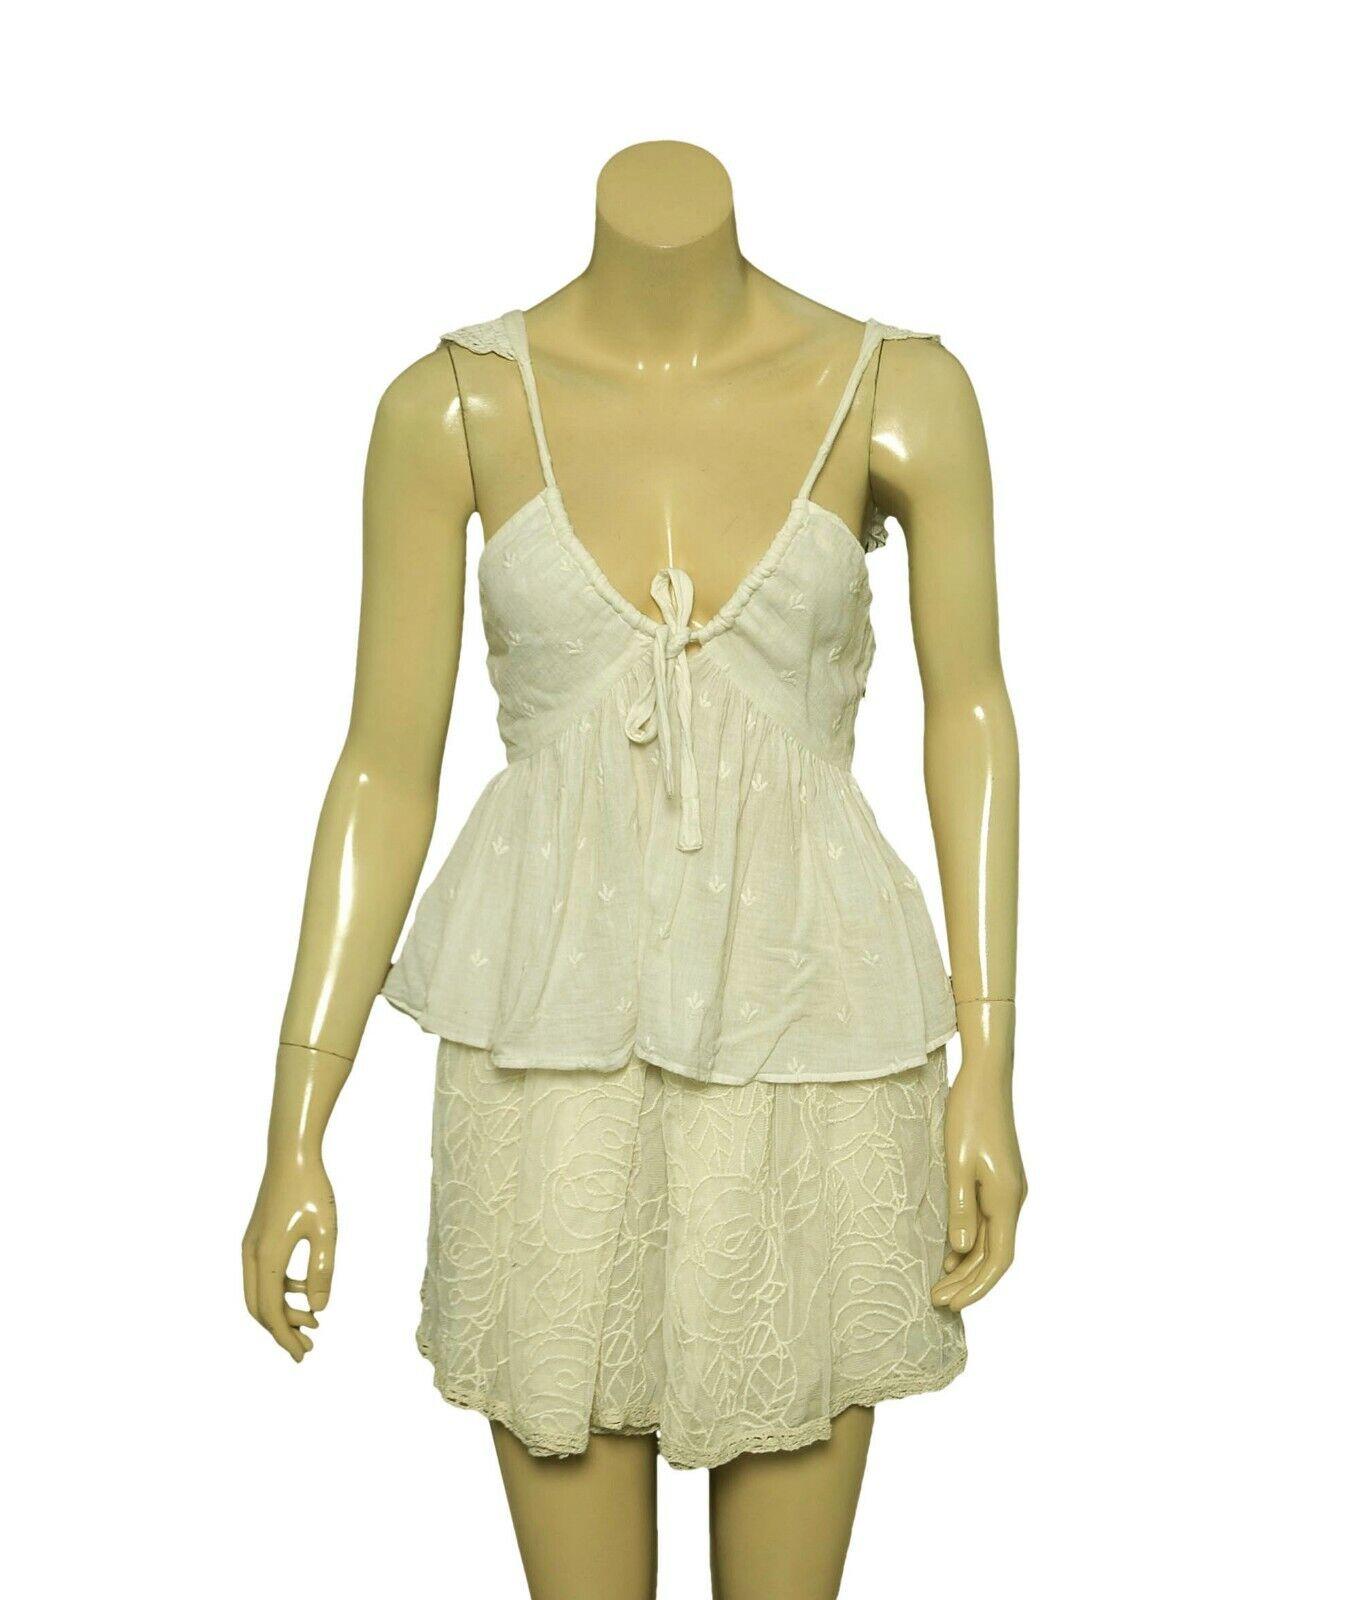 8143 New Ulla Johnson Embroiedrot Crochet  Sleeveless Cotton Crop Blouse Top XS